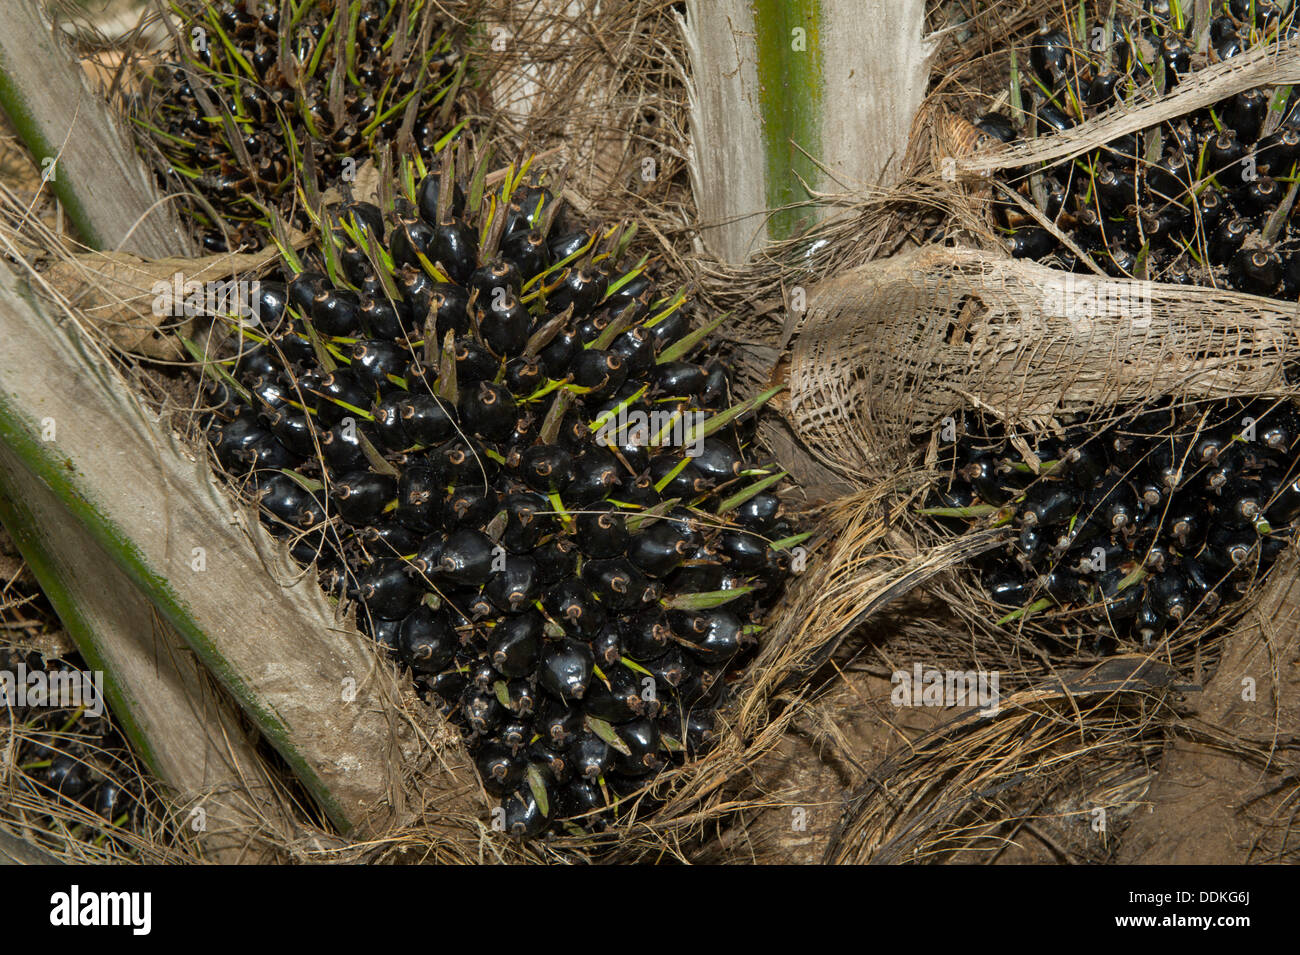 Fruit of oil palms, Nigeria - Stock Image